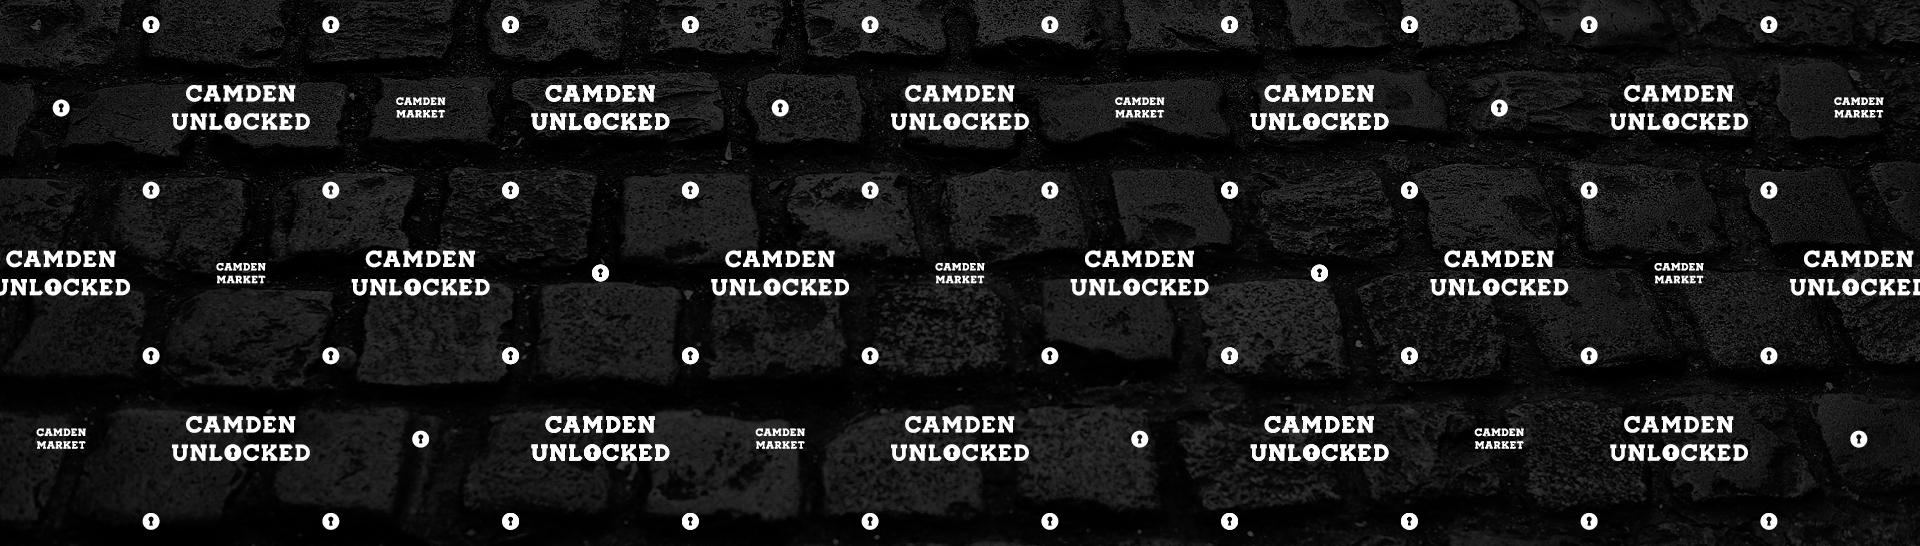 Camden-Unlocked-%E2%80%93-Repeat-Pattern-Versions-1920x546-1